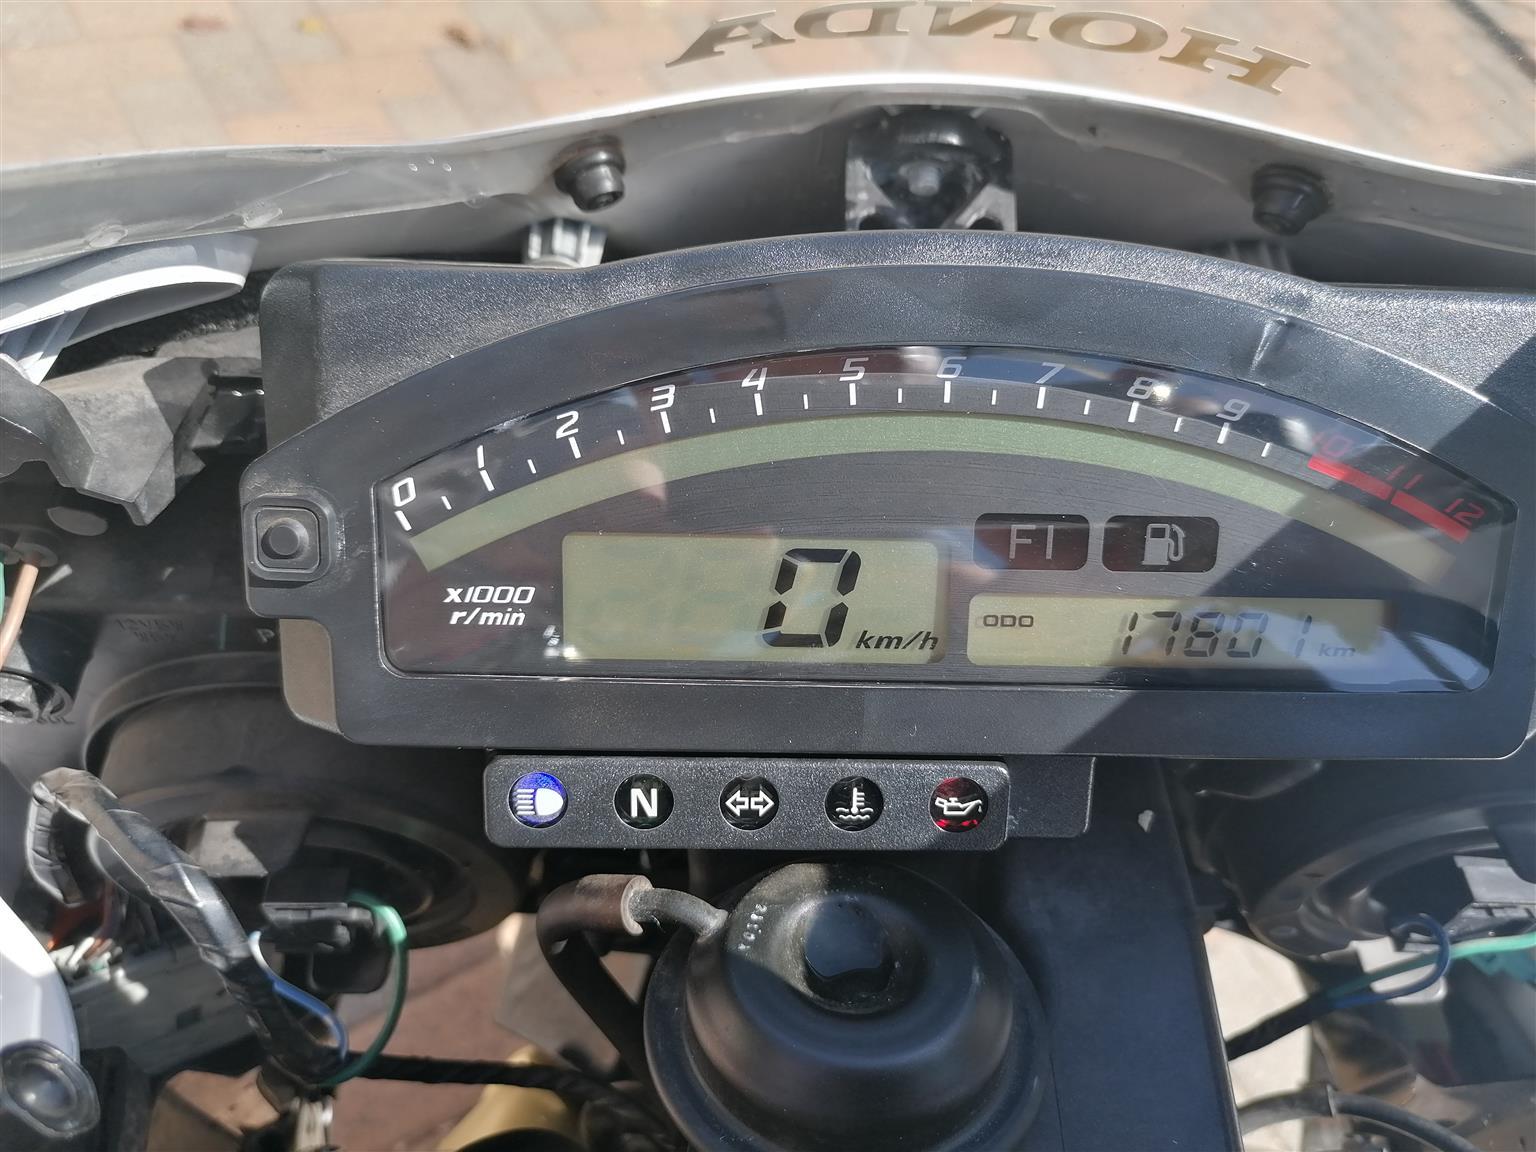 2004 Honda VTR